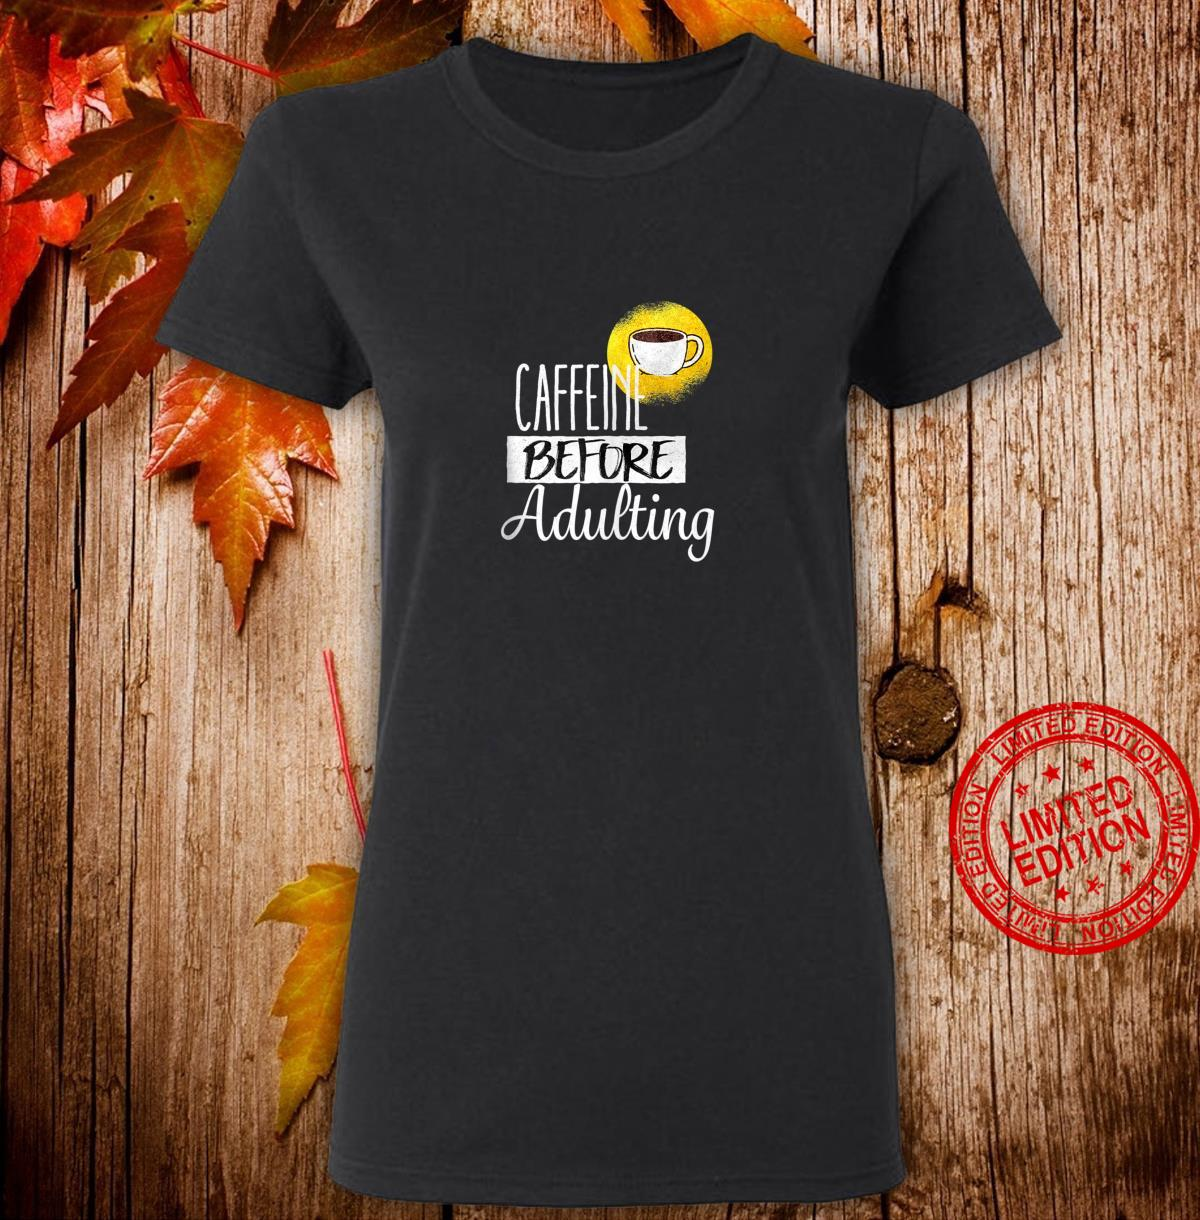 Funny Coffee ShirtCaffeine before adulting Shirt ladies tee